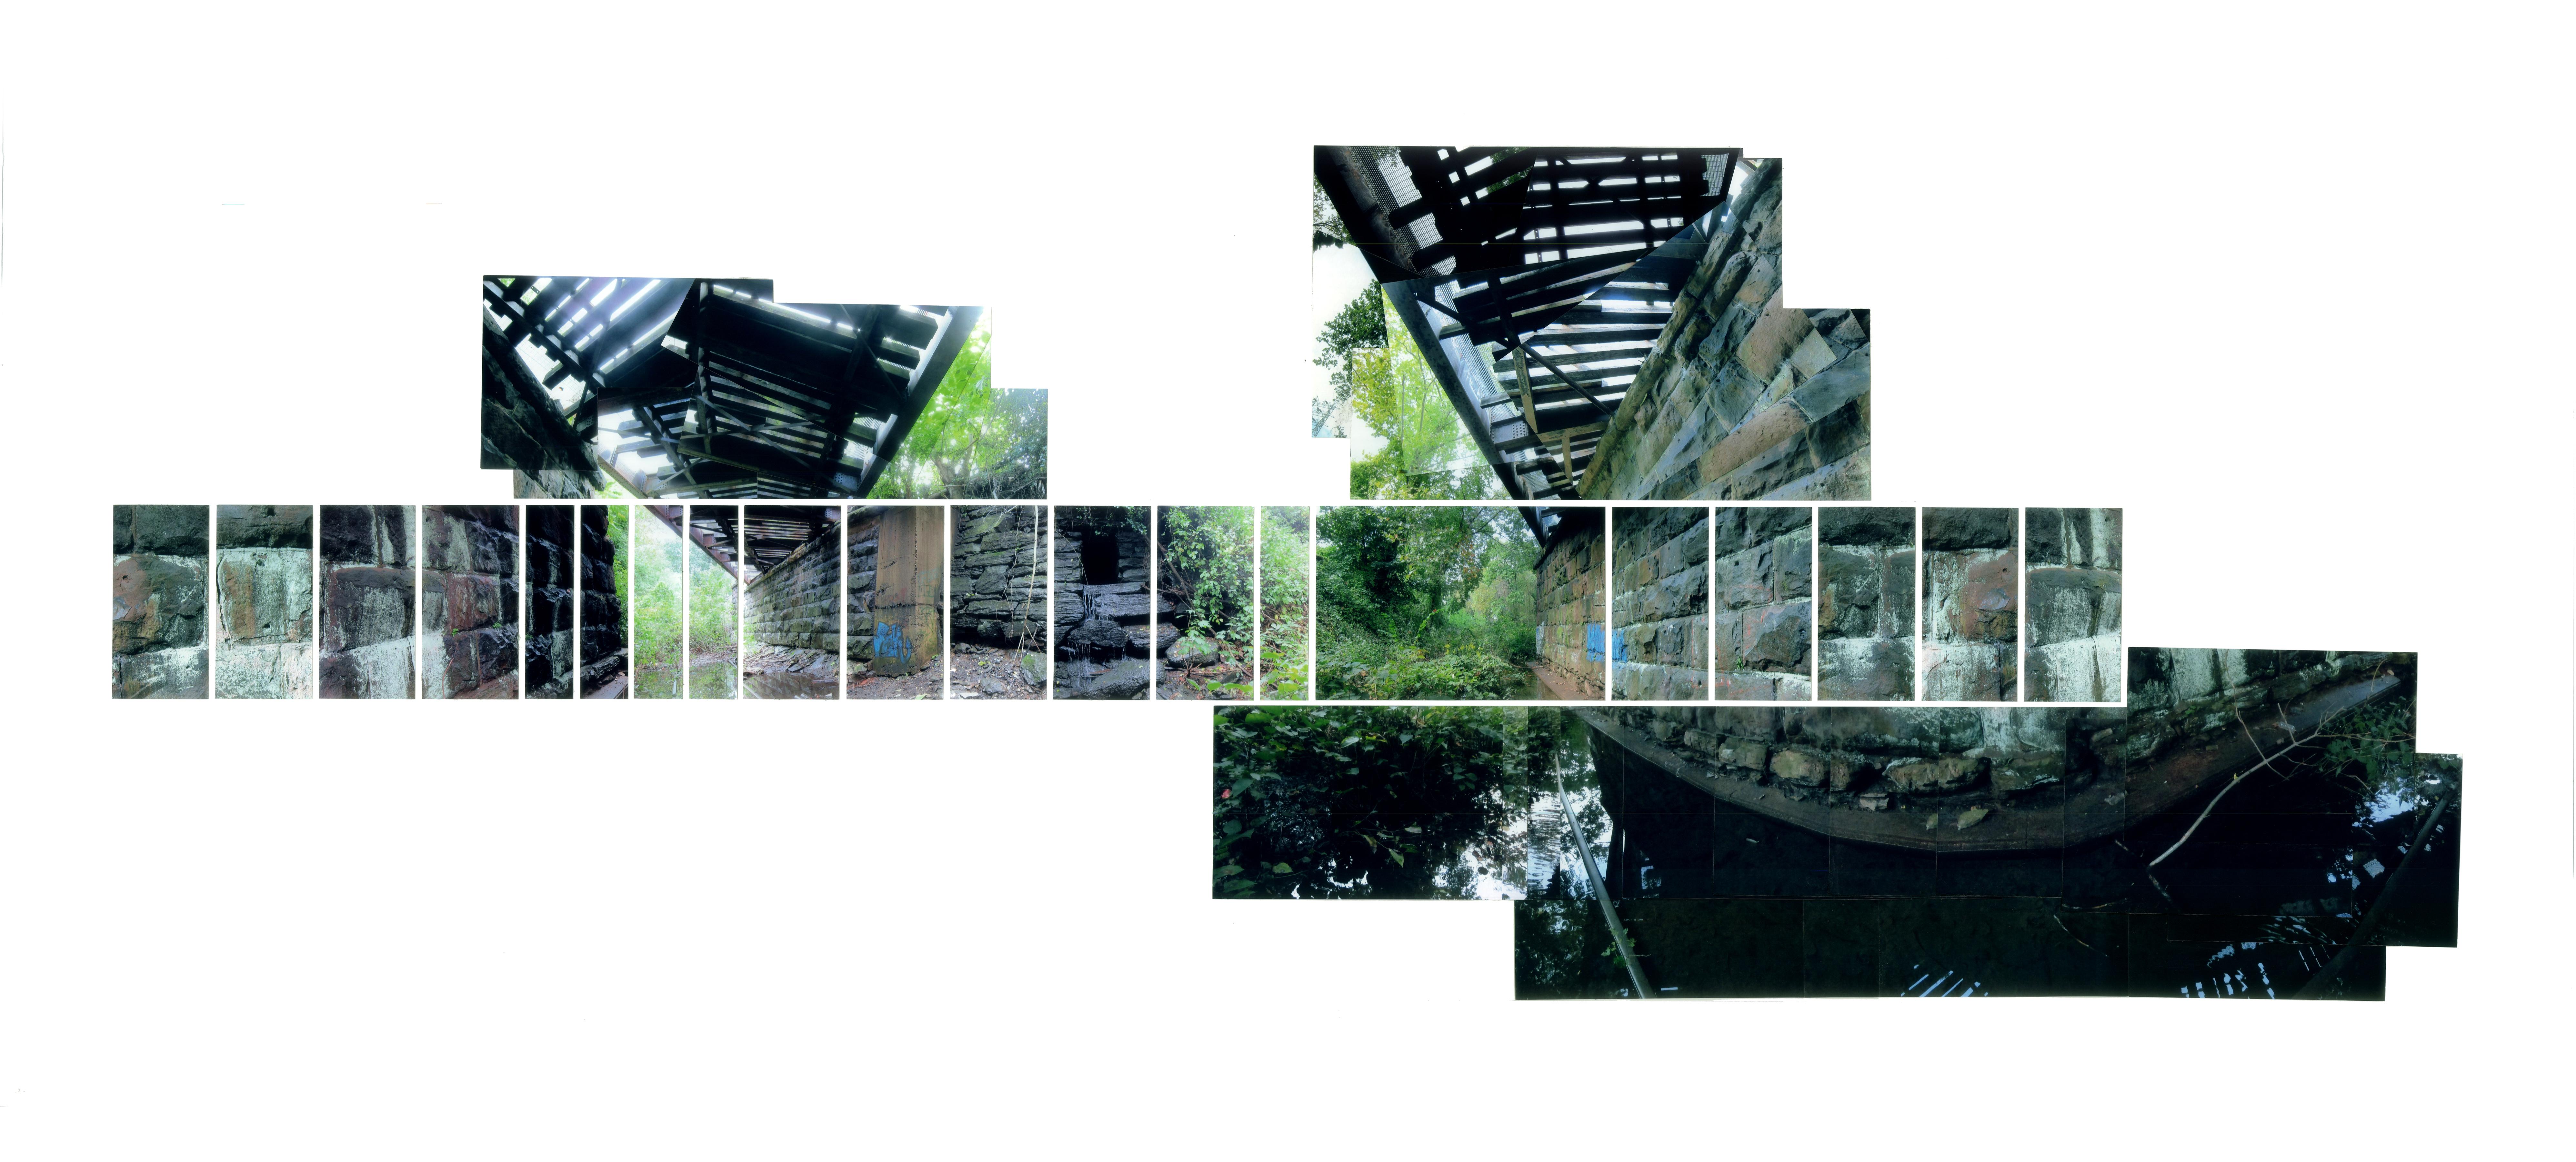 501_photo2.jpg